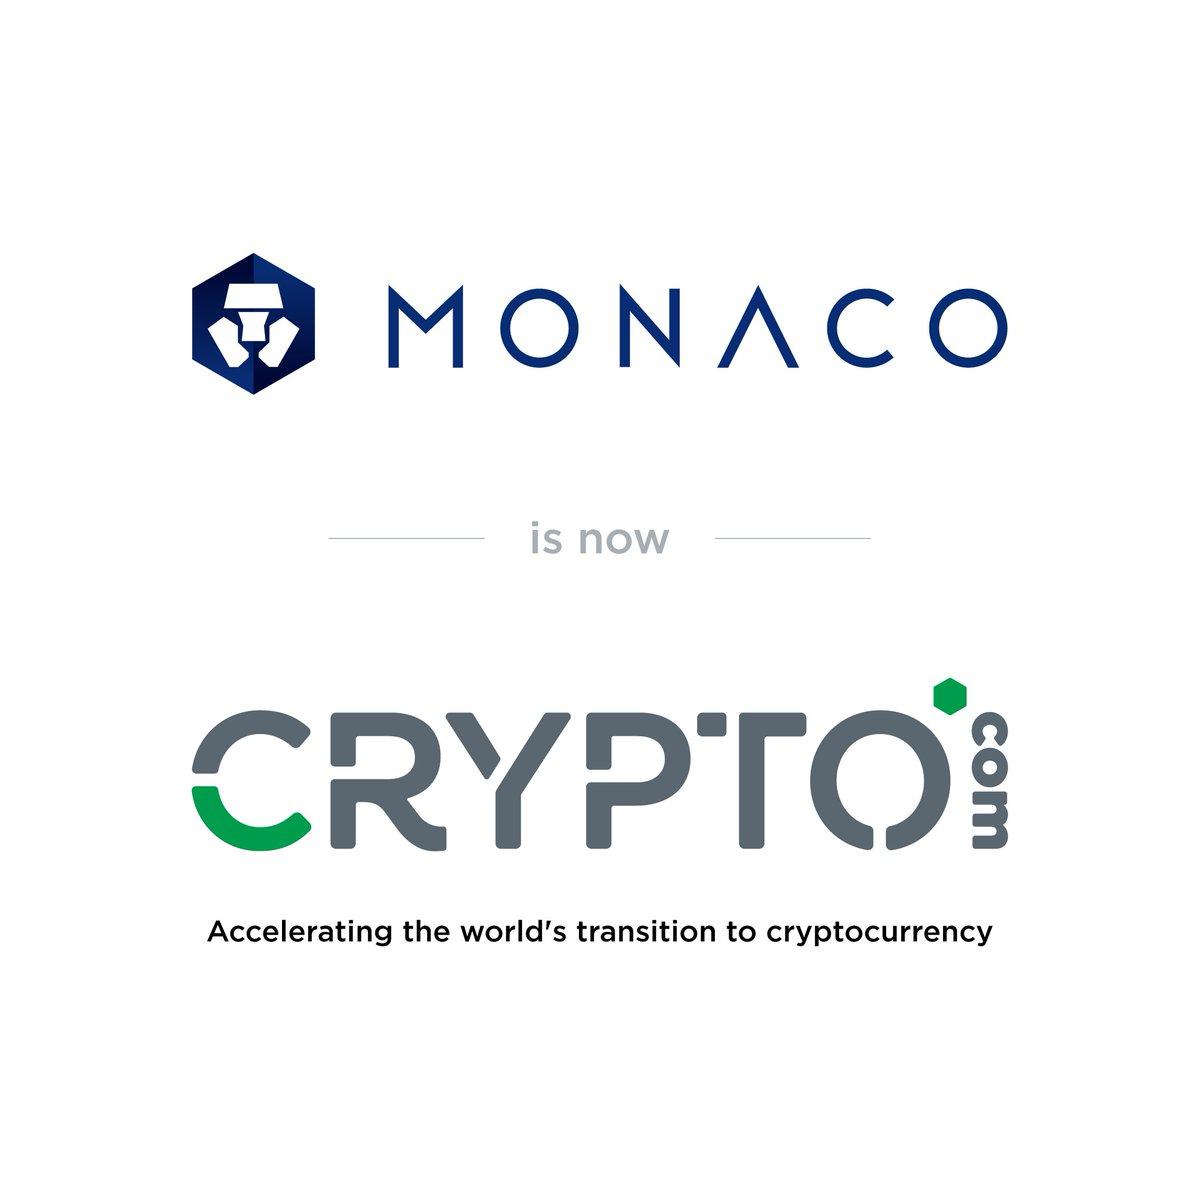 monaco wallet cryptocurrency